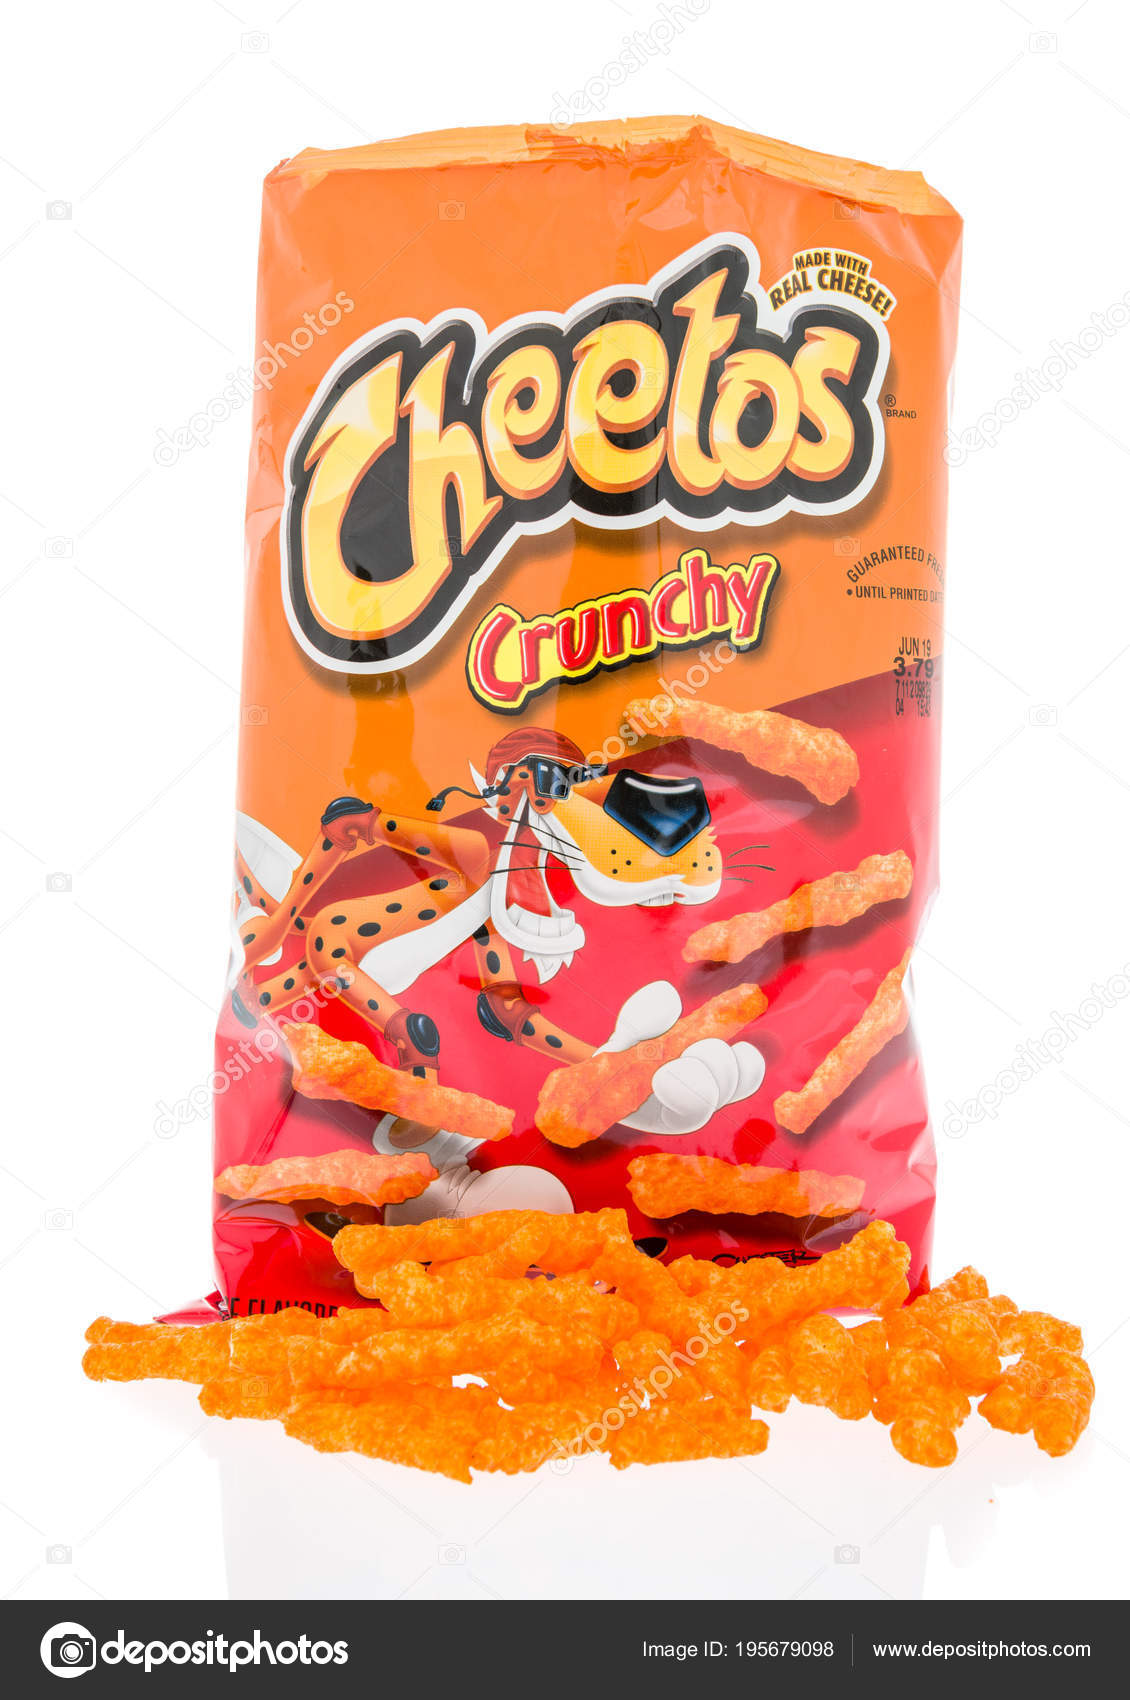 bag of cheetos – stock editorial photo © homank76 #195679098